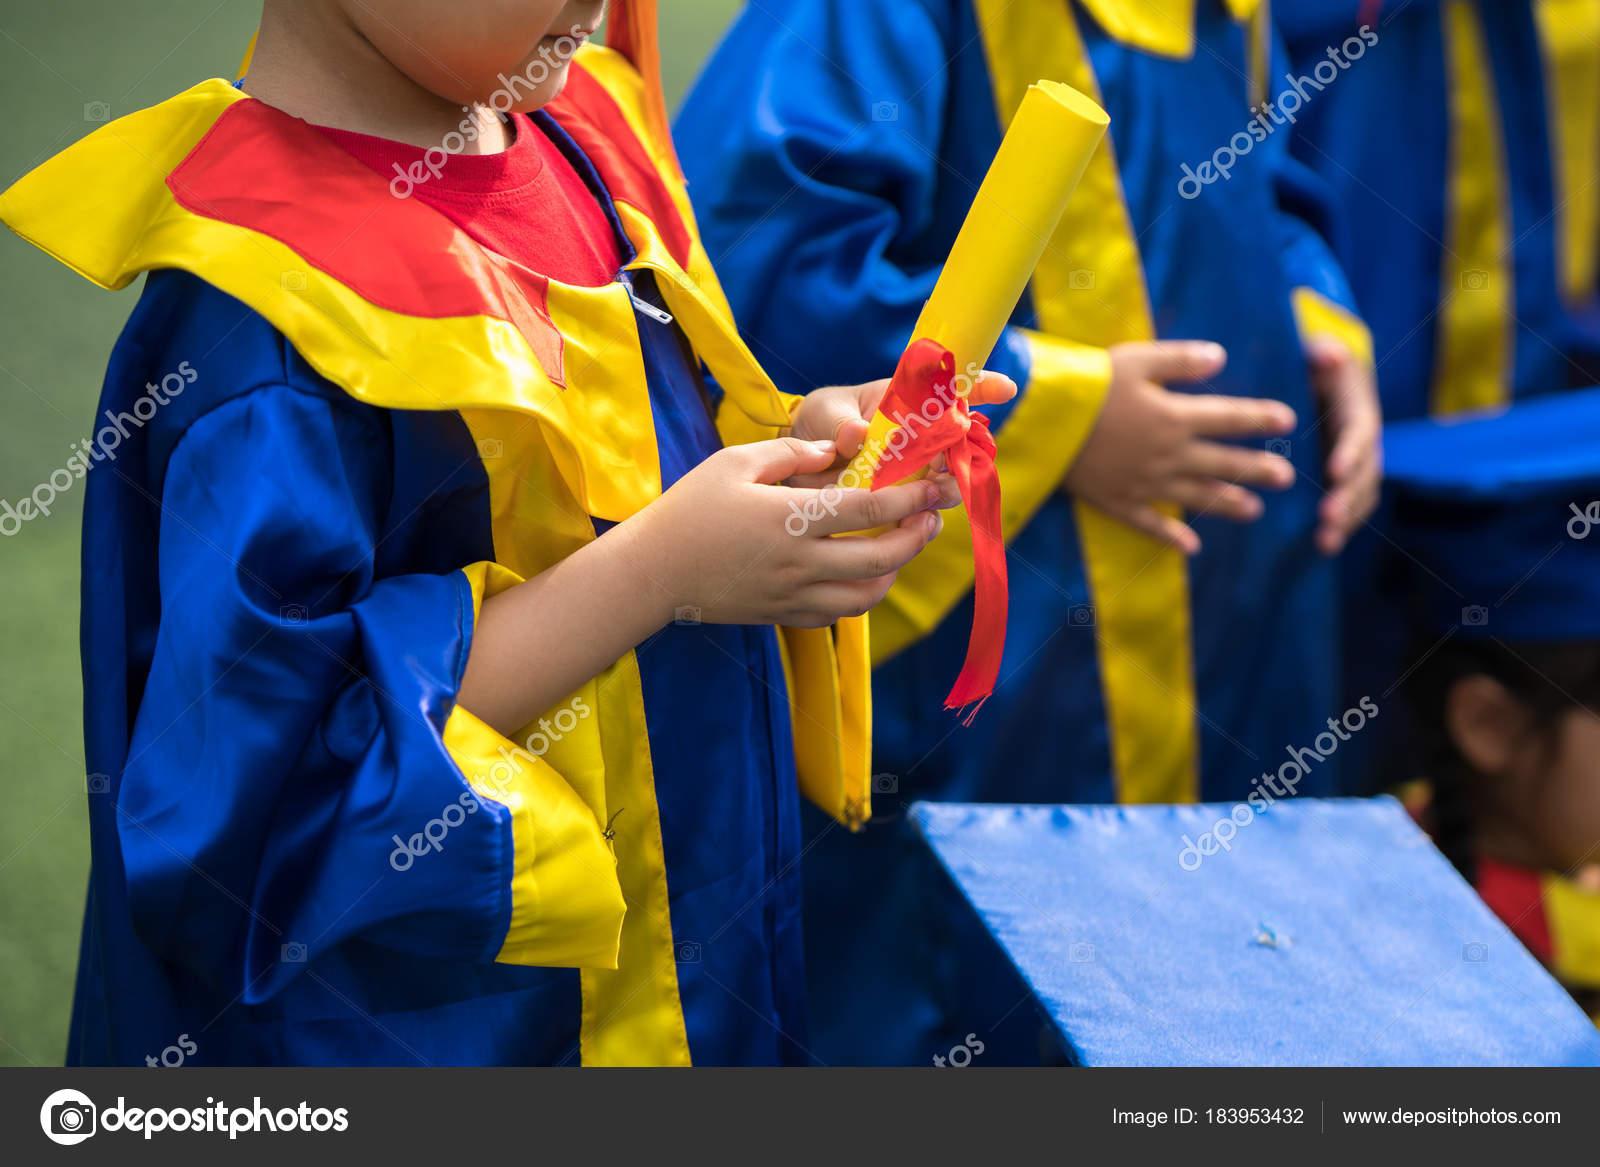 Fotos Graduacion Preescolar Preescolar Niño Vestido De